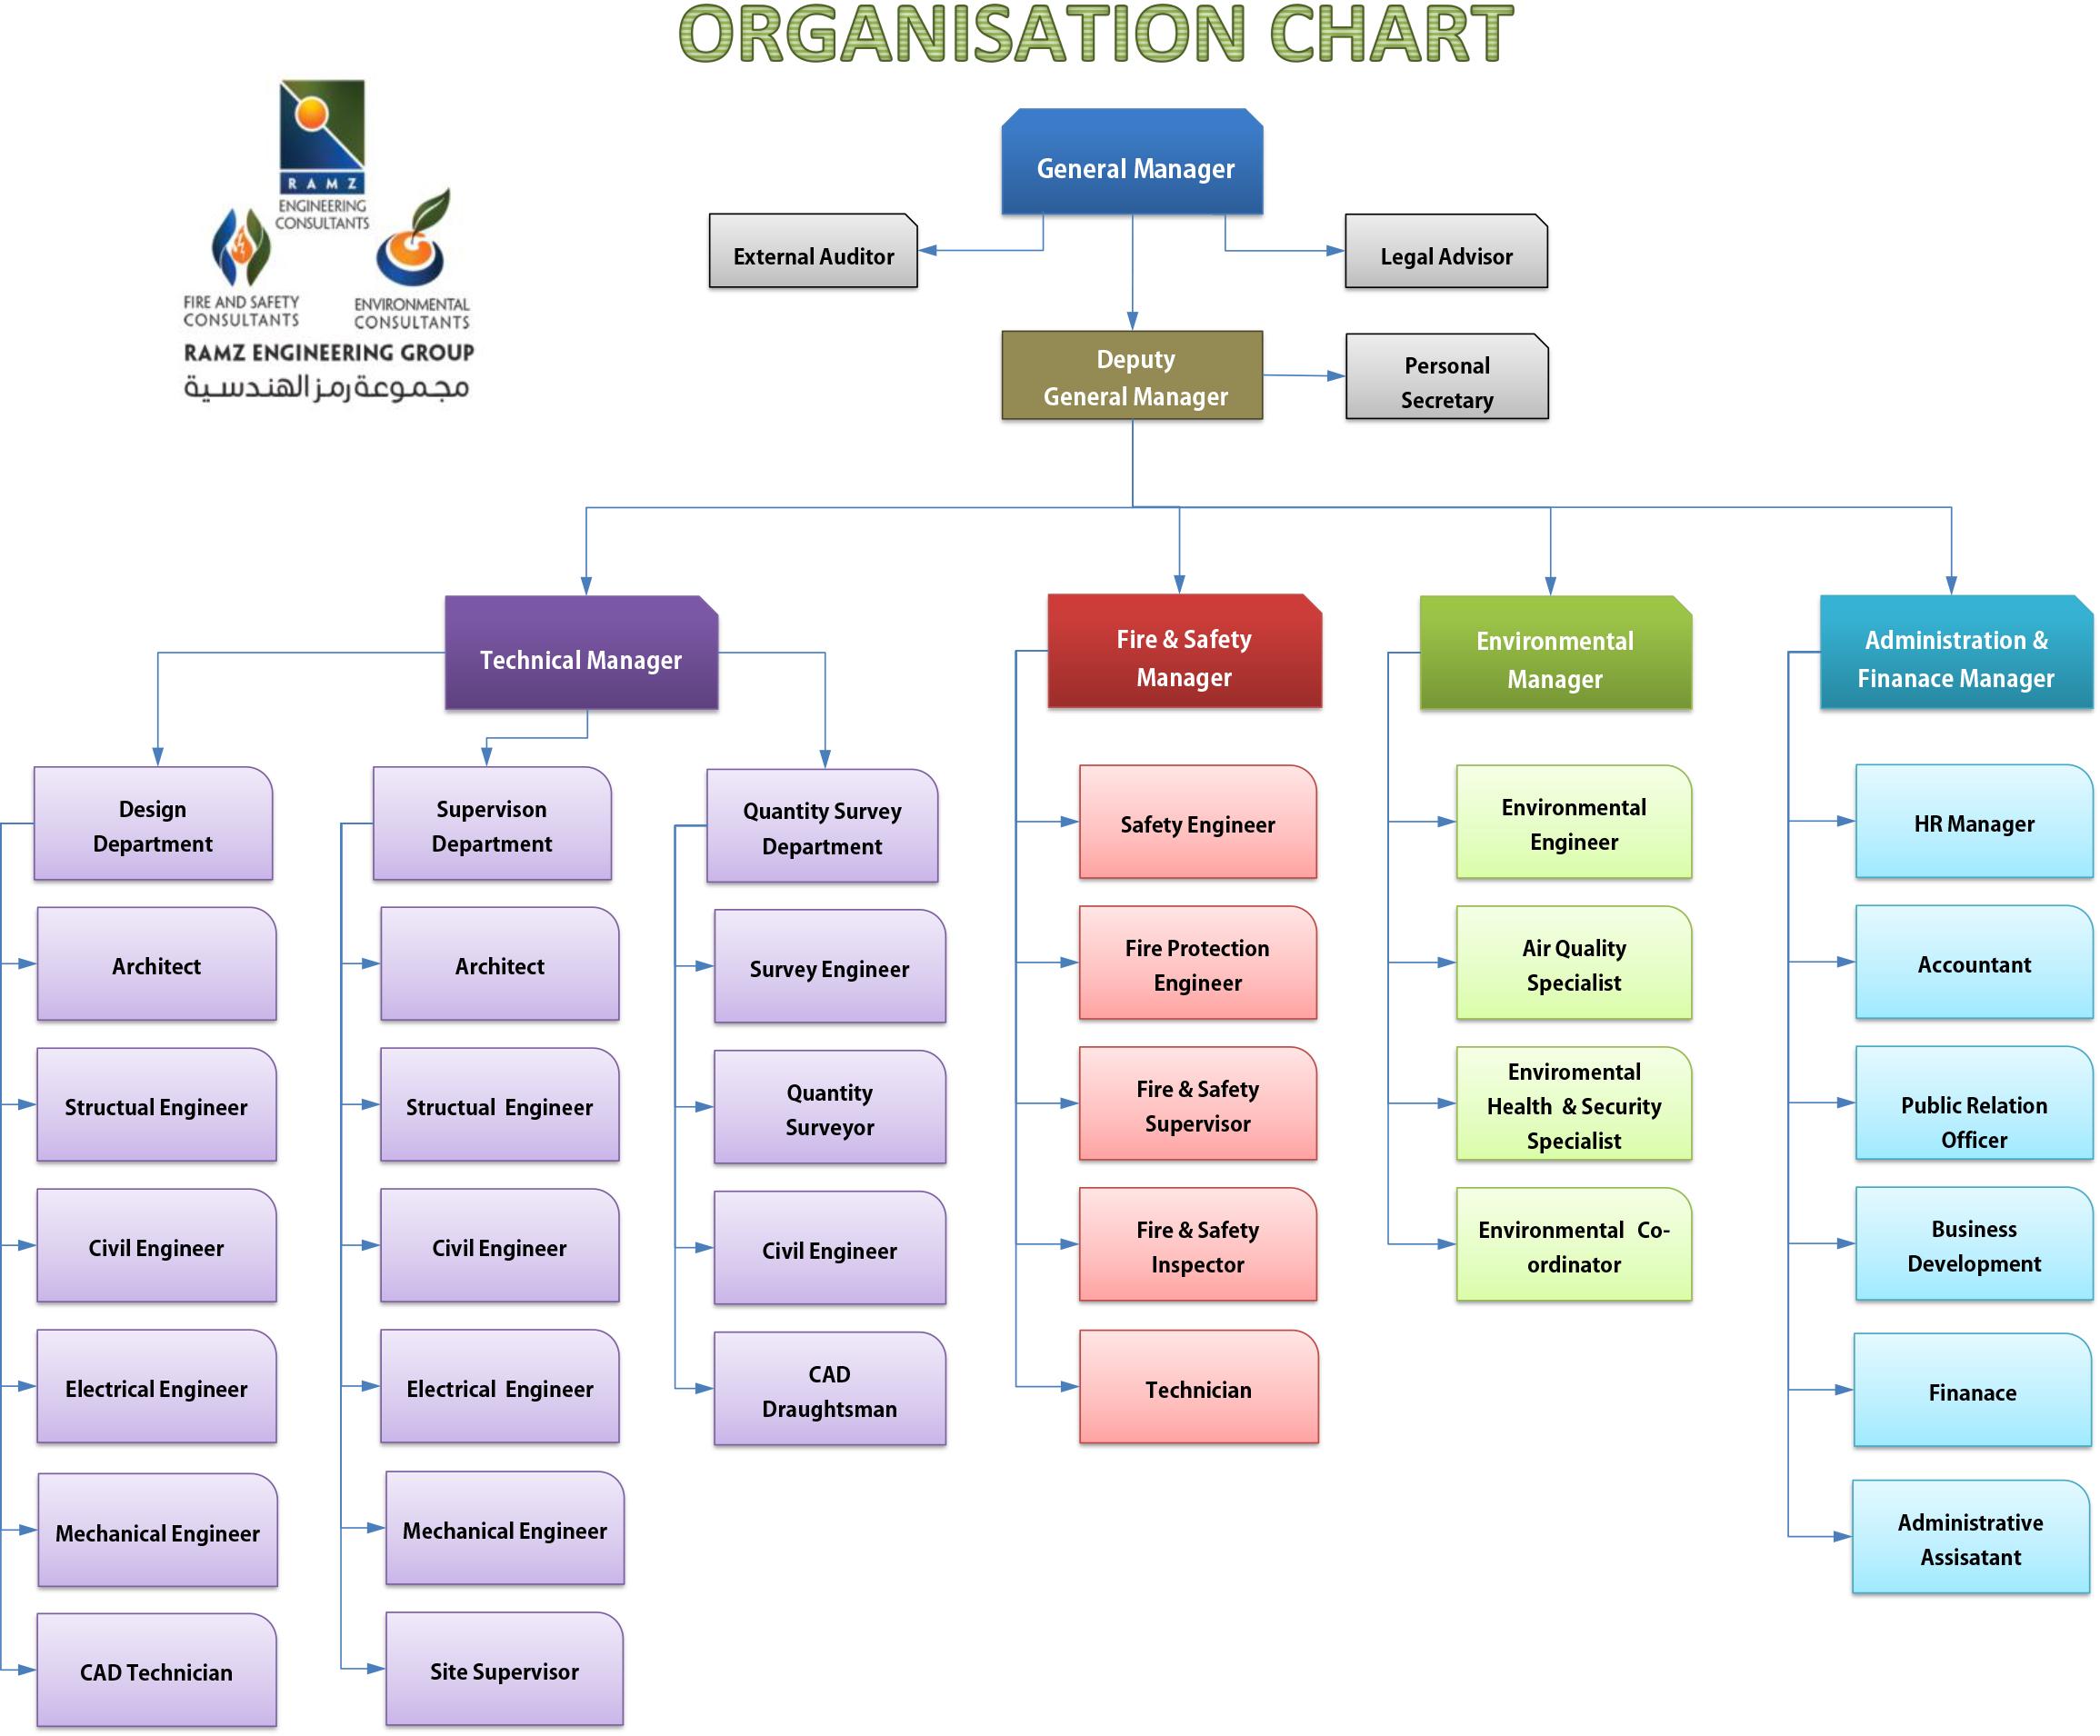 ASD SSG Radar Chart  ePLM Interoperability